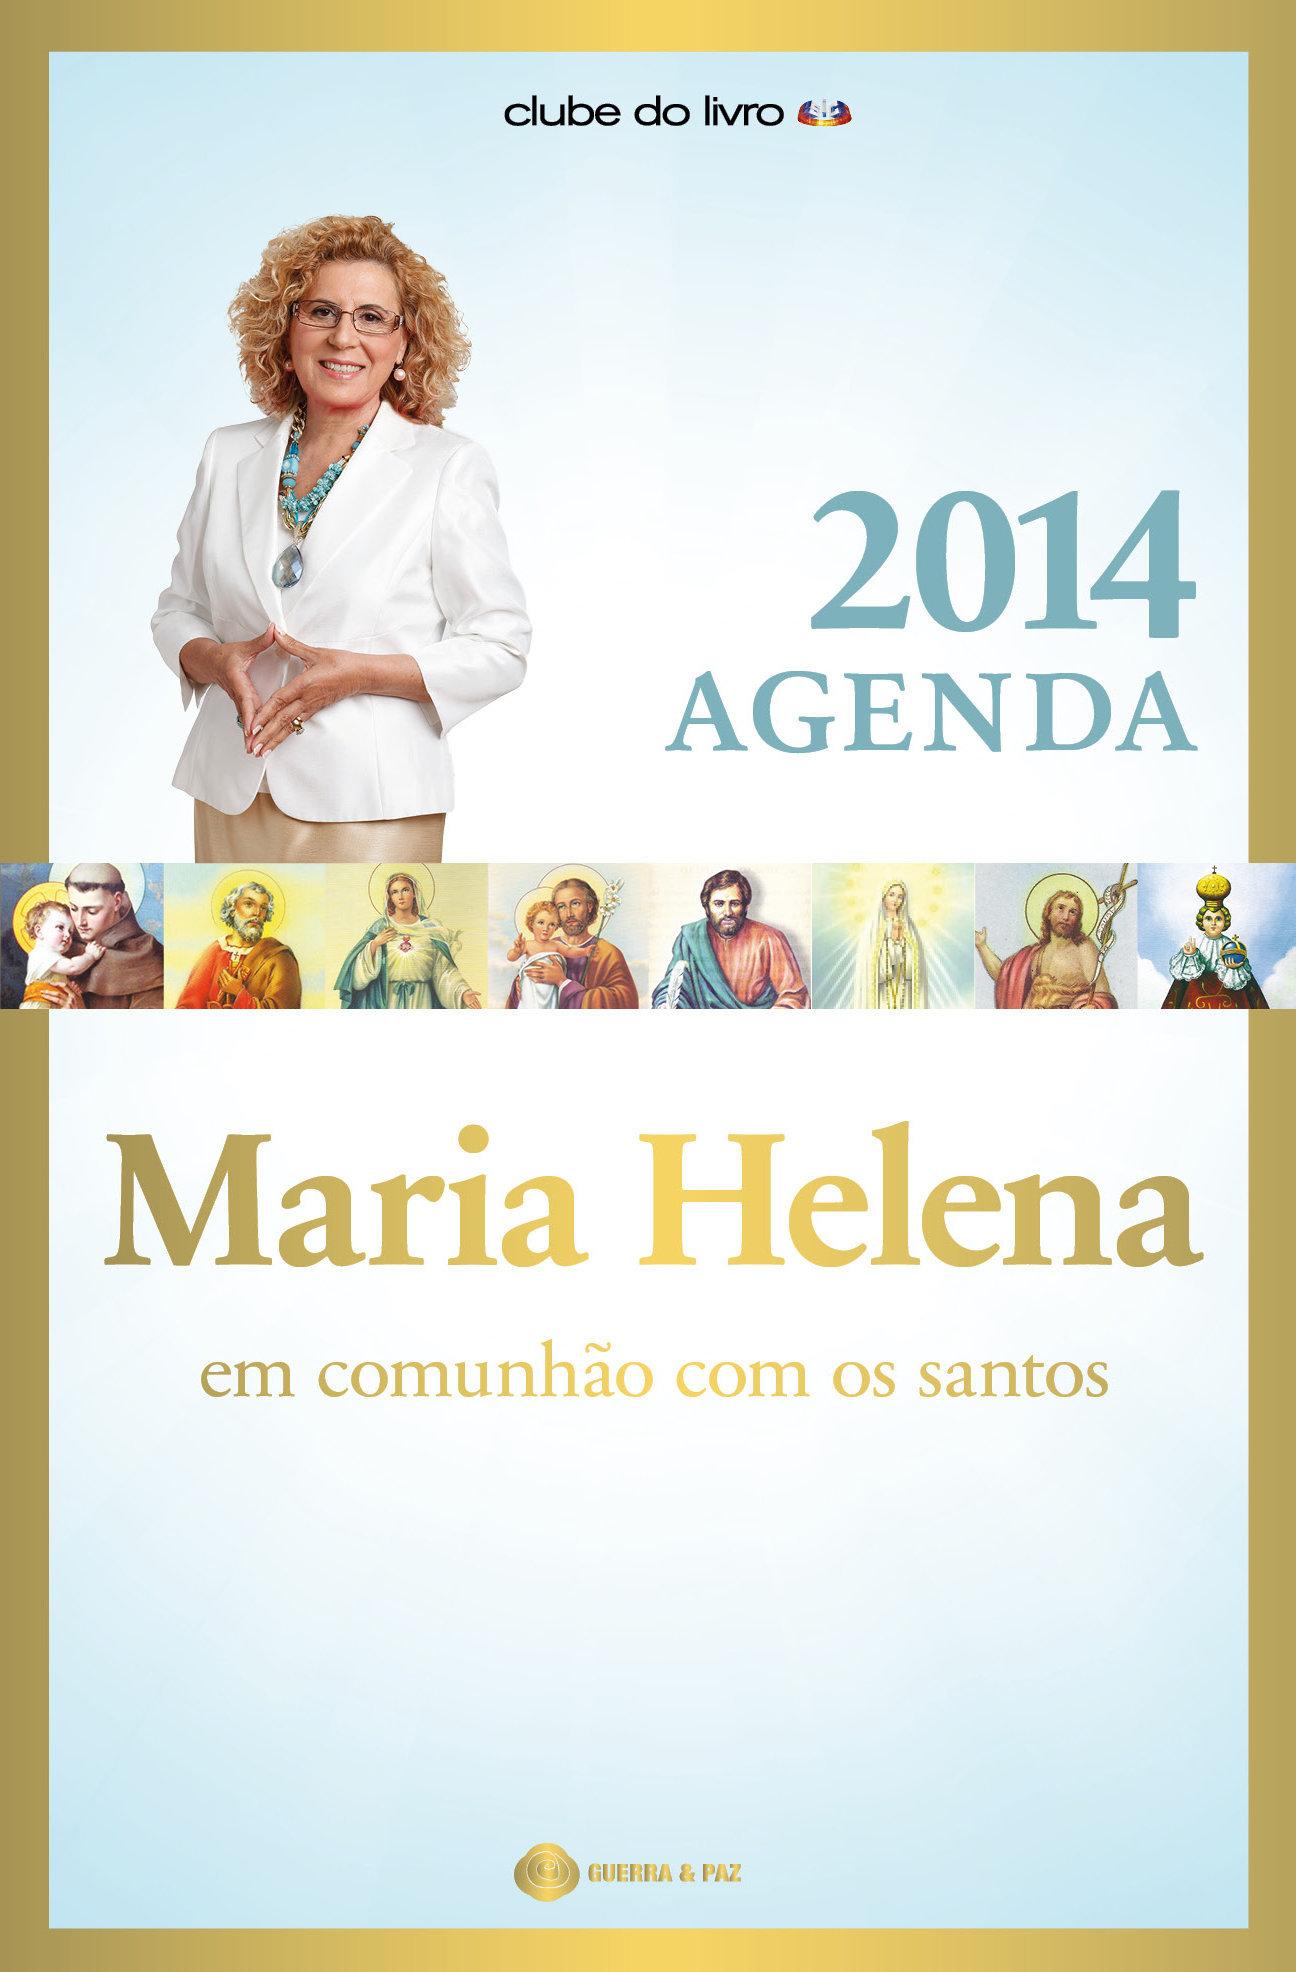 capa_agenda_300dpi.jpg